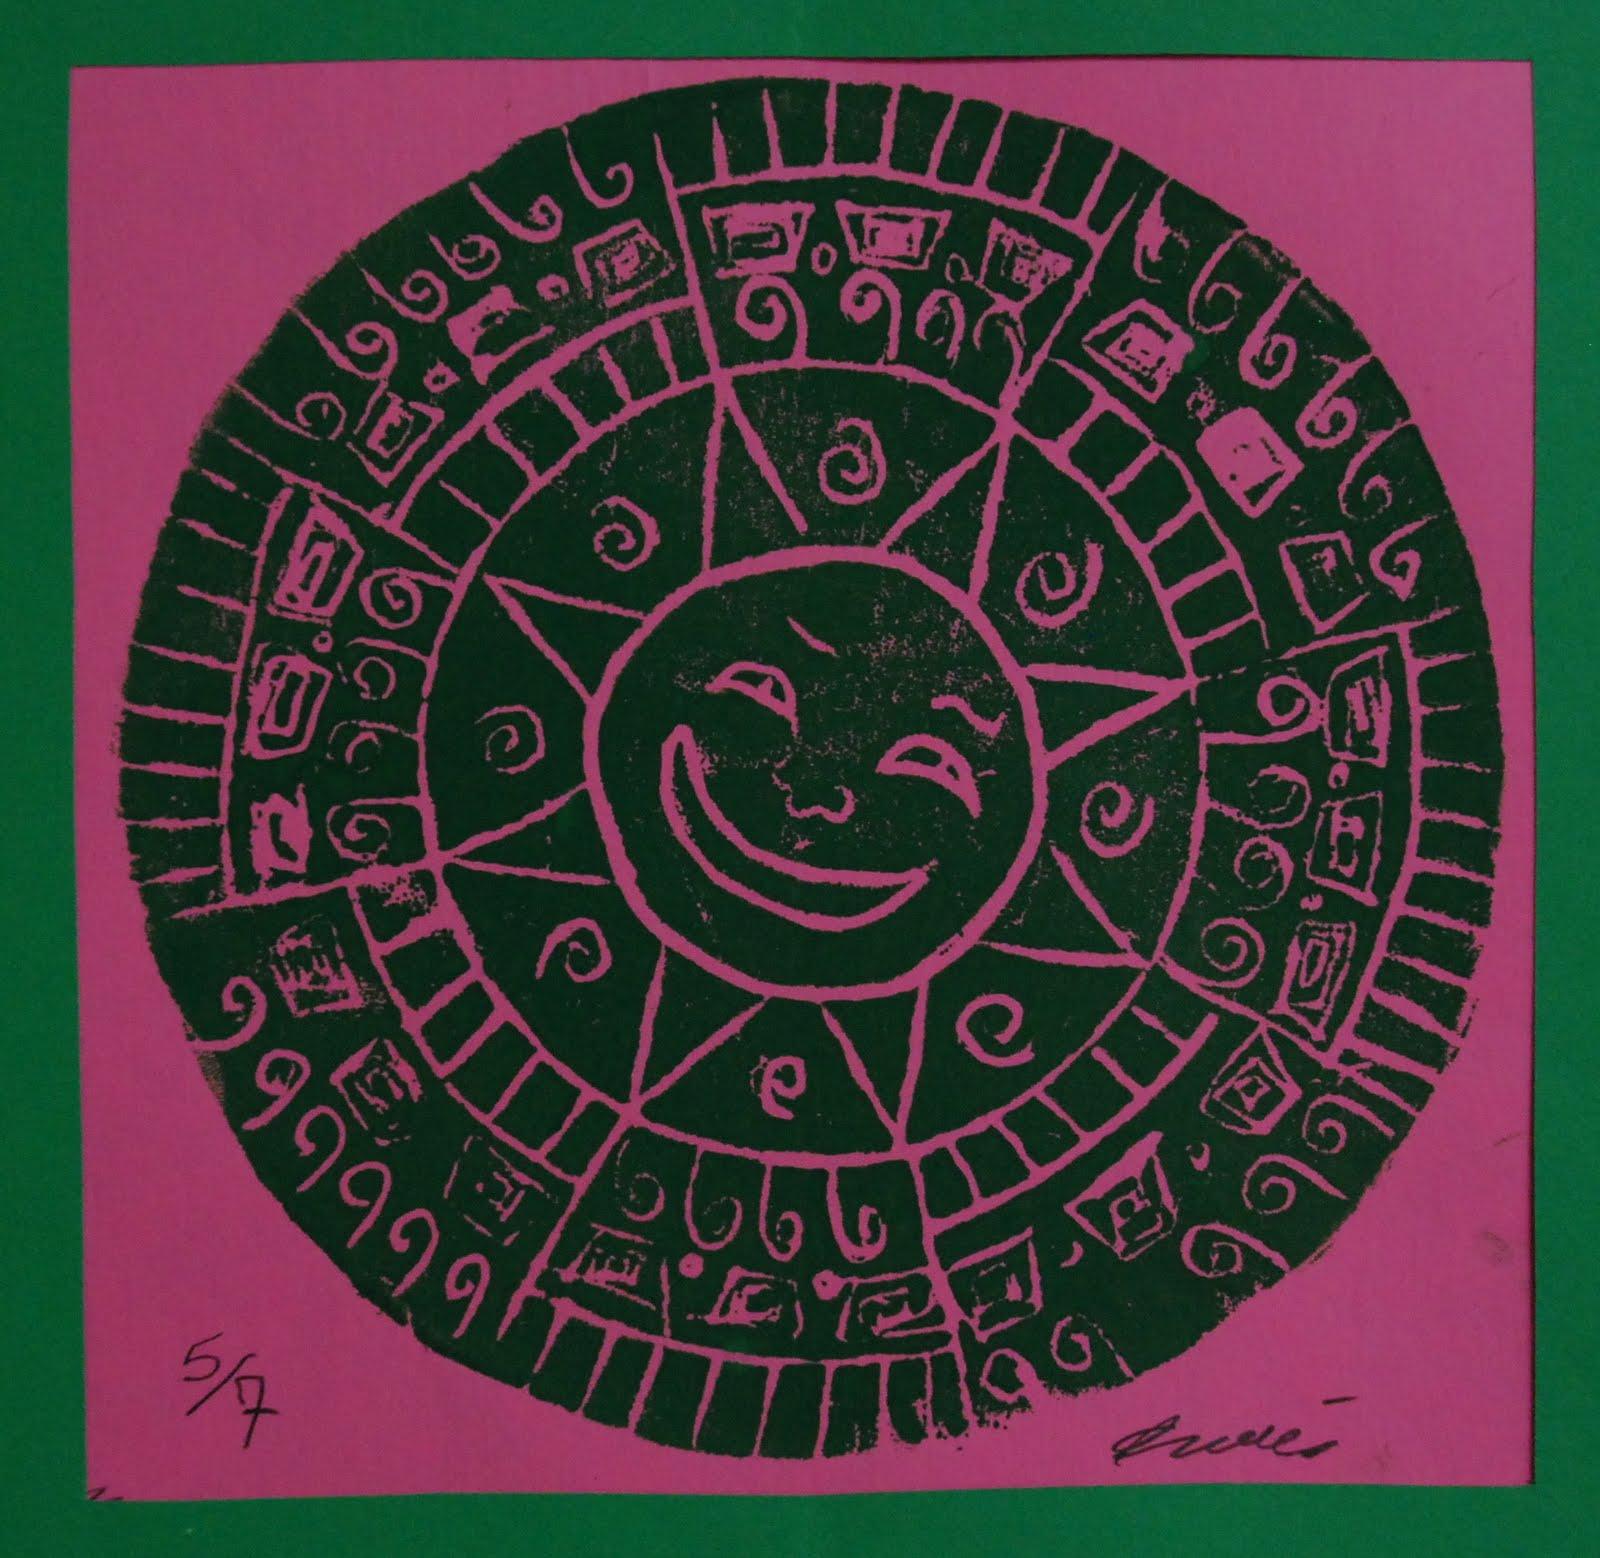 Seoul Mates: Aztec Sun Stone Prints